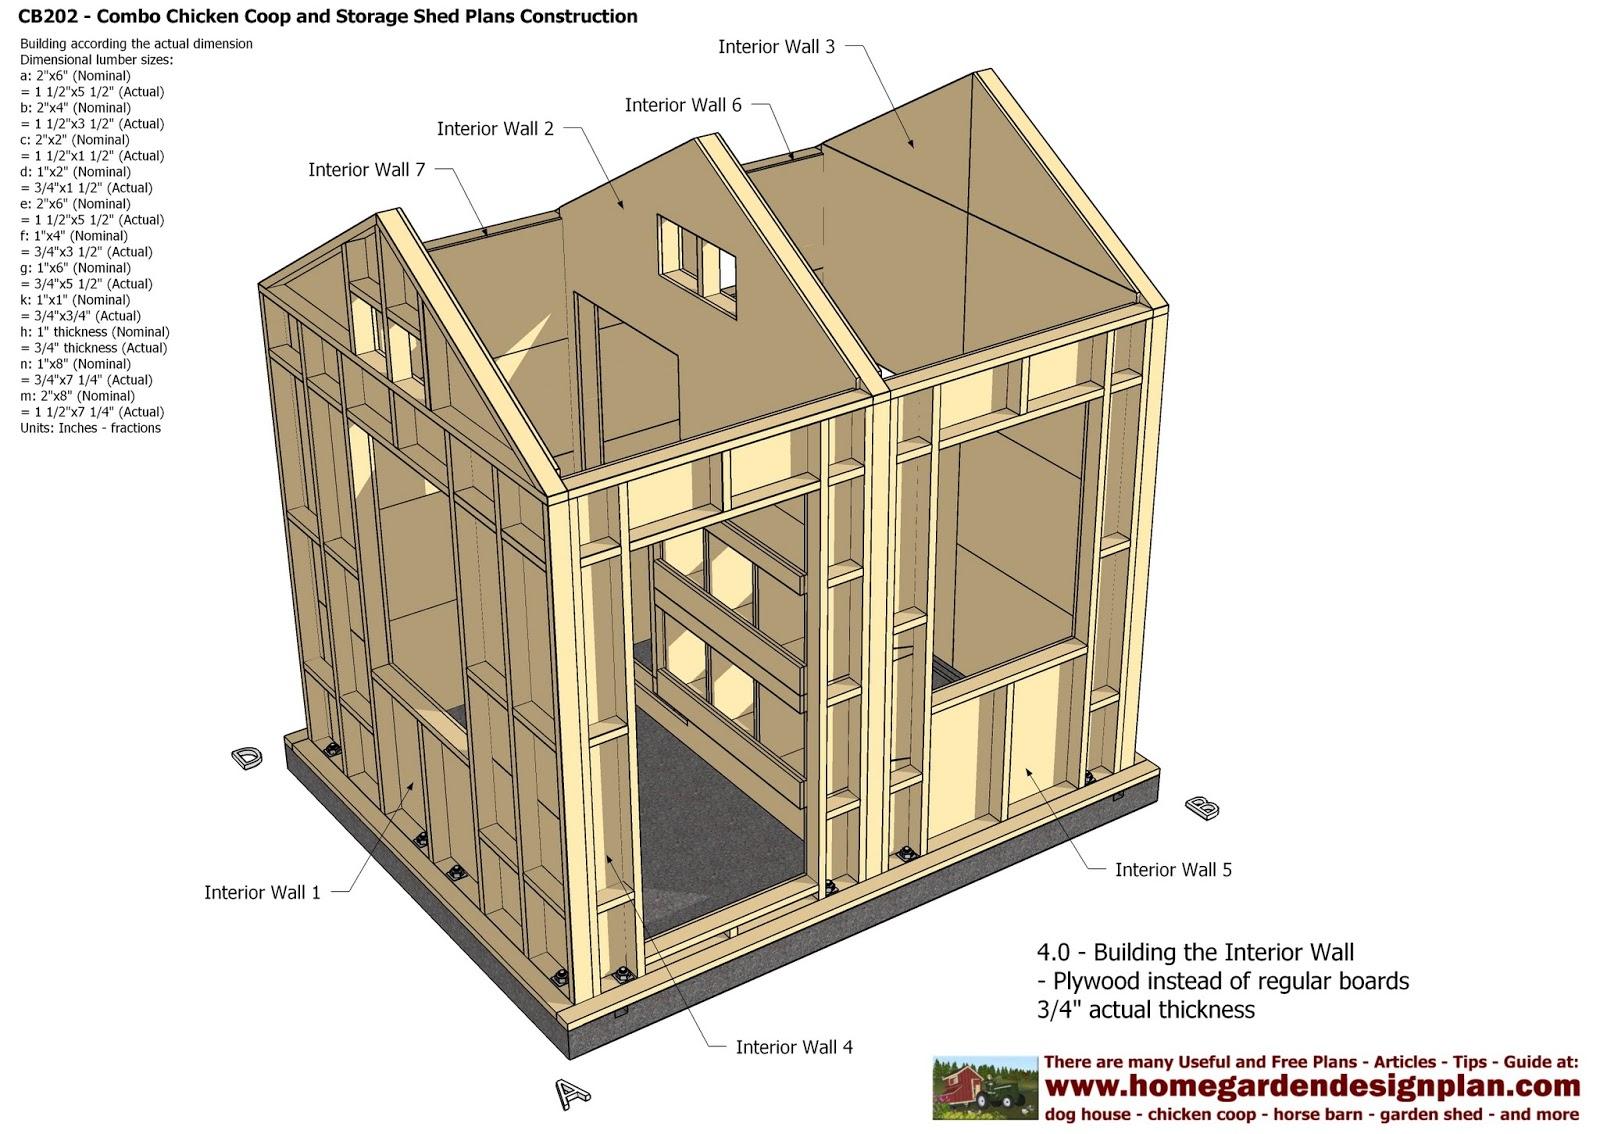 CB202 Combo Plans Chicken Coop Plans Construction Garden Sheds Plans Storage Sheds Plans Construction ~ shed making plans  sc 1 st  shed making plans & CB202 Combo Plans Chicken Coop Plans Construction Garden Sheds Plans ...